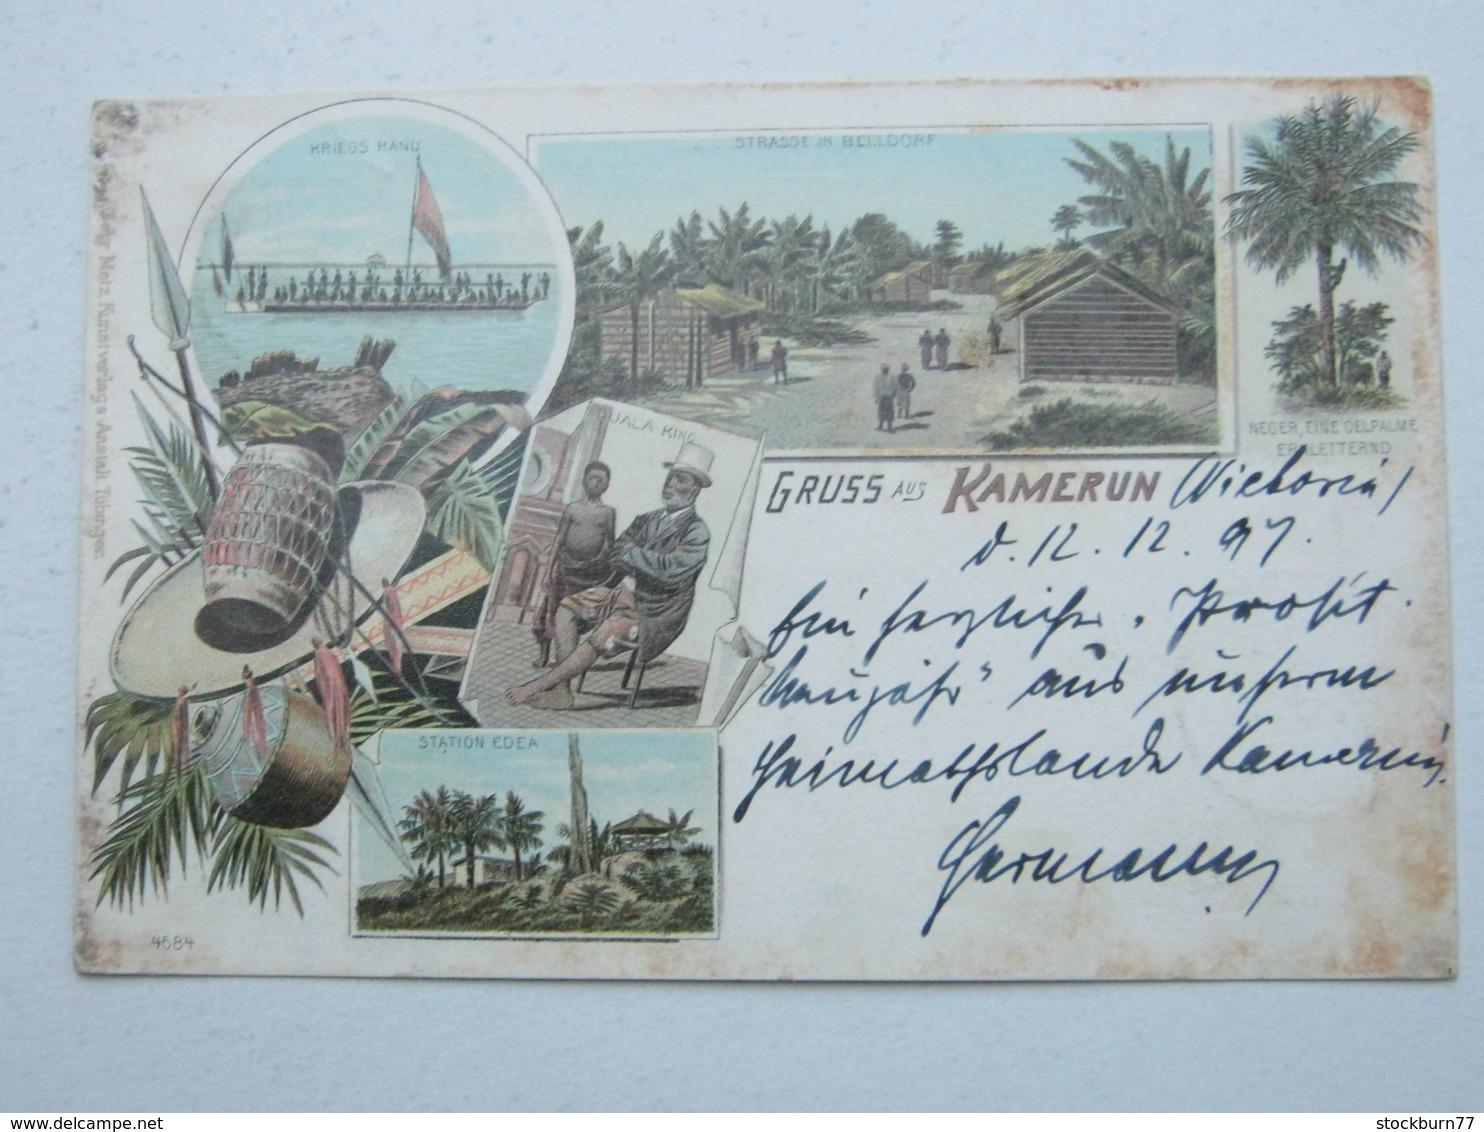 KAMERUN , Ansichtskarte Mit Stempel  Kamerun  1897 - Kolonie: Kamerun